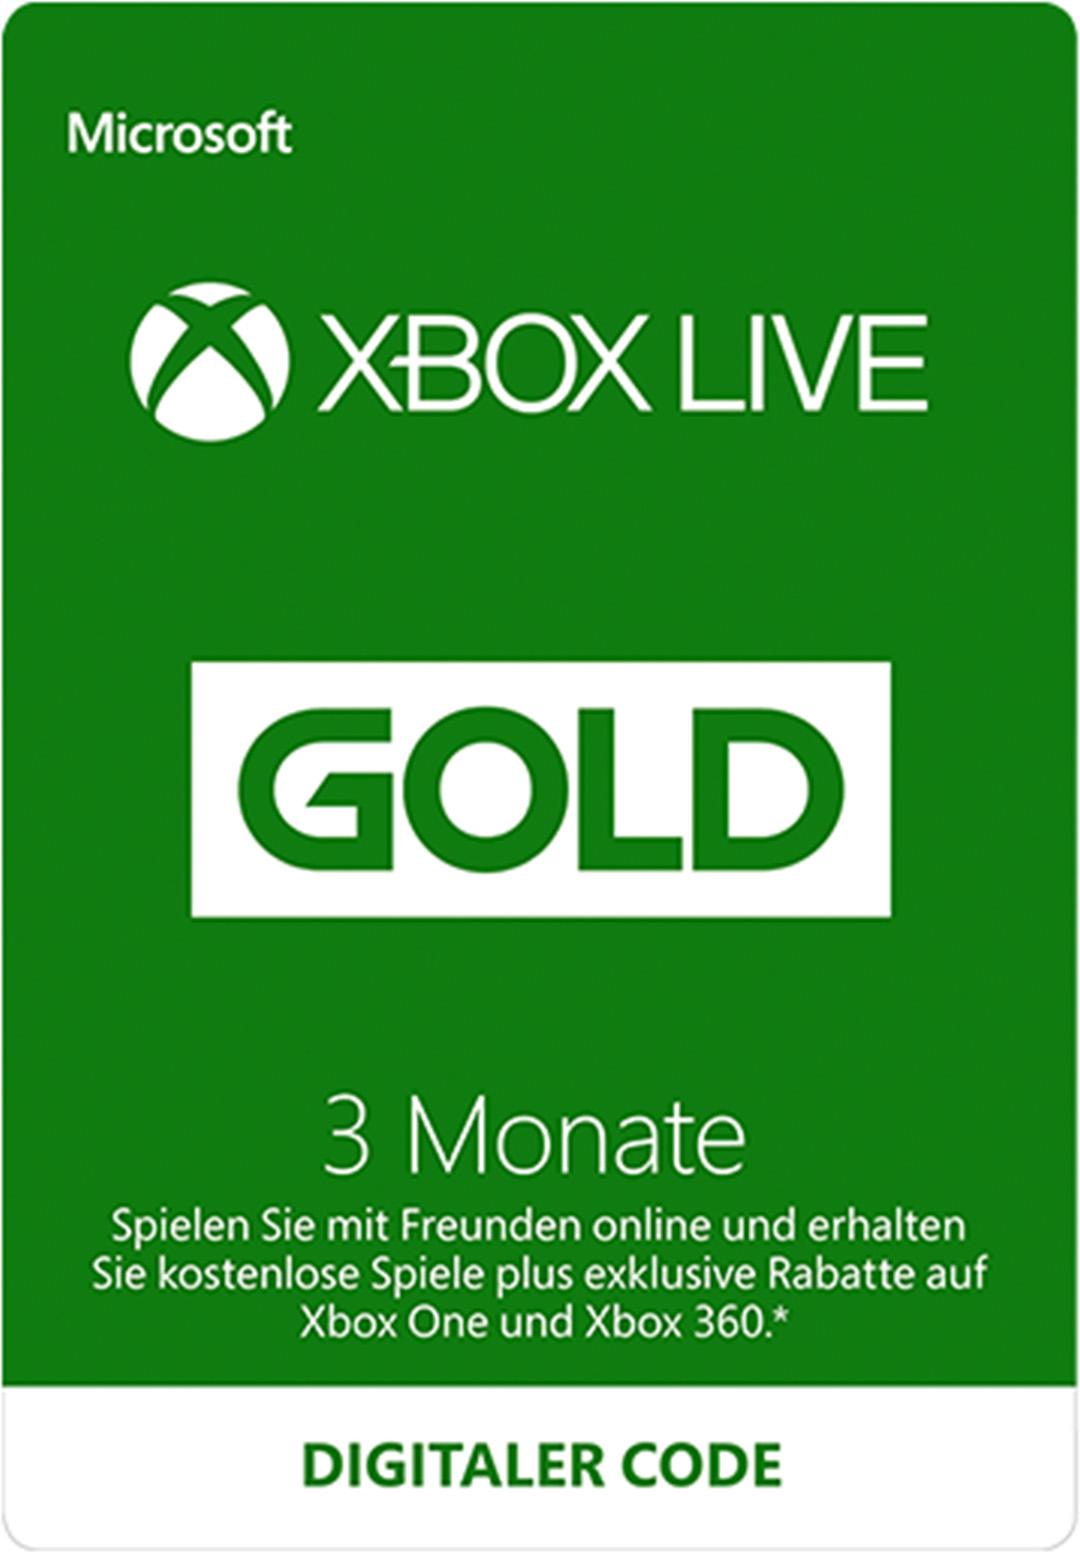 xbox live karte Xbox Live Gold Mitgliedschaft (Digital Code) kaufen – Microsoft